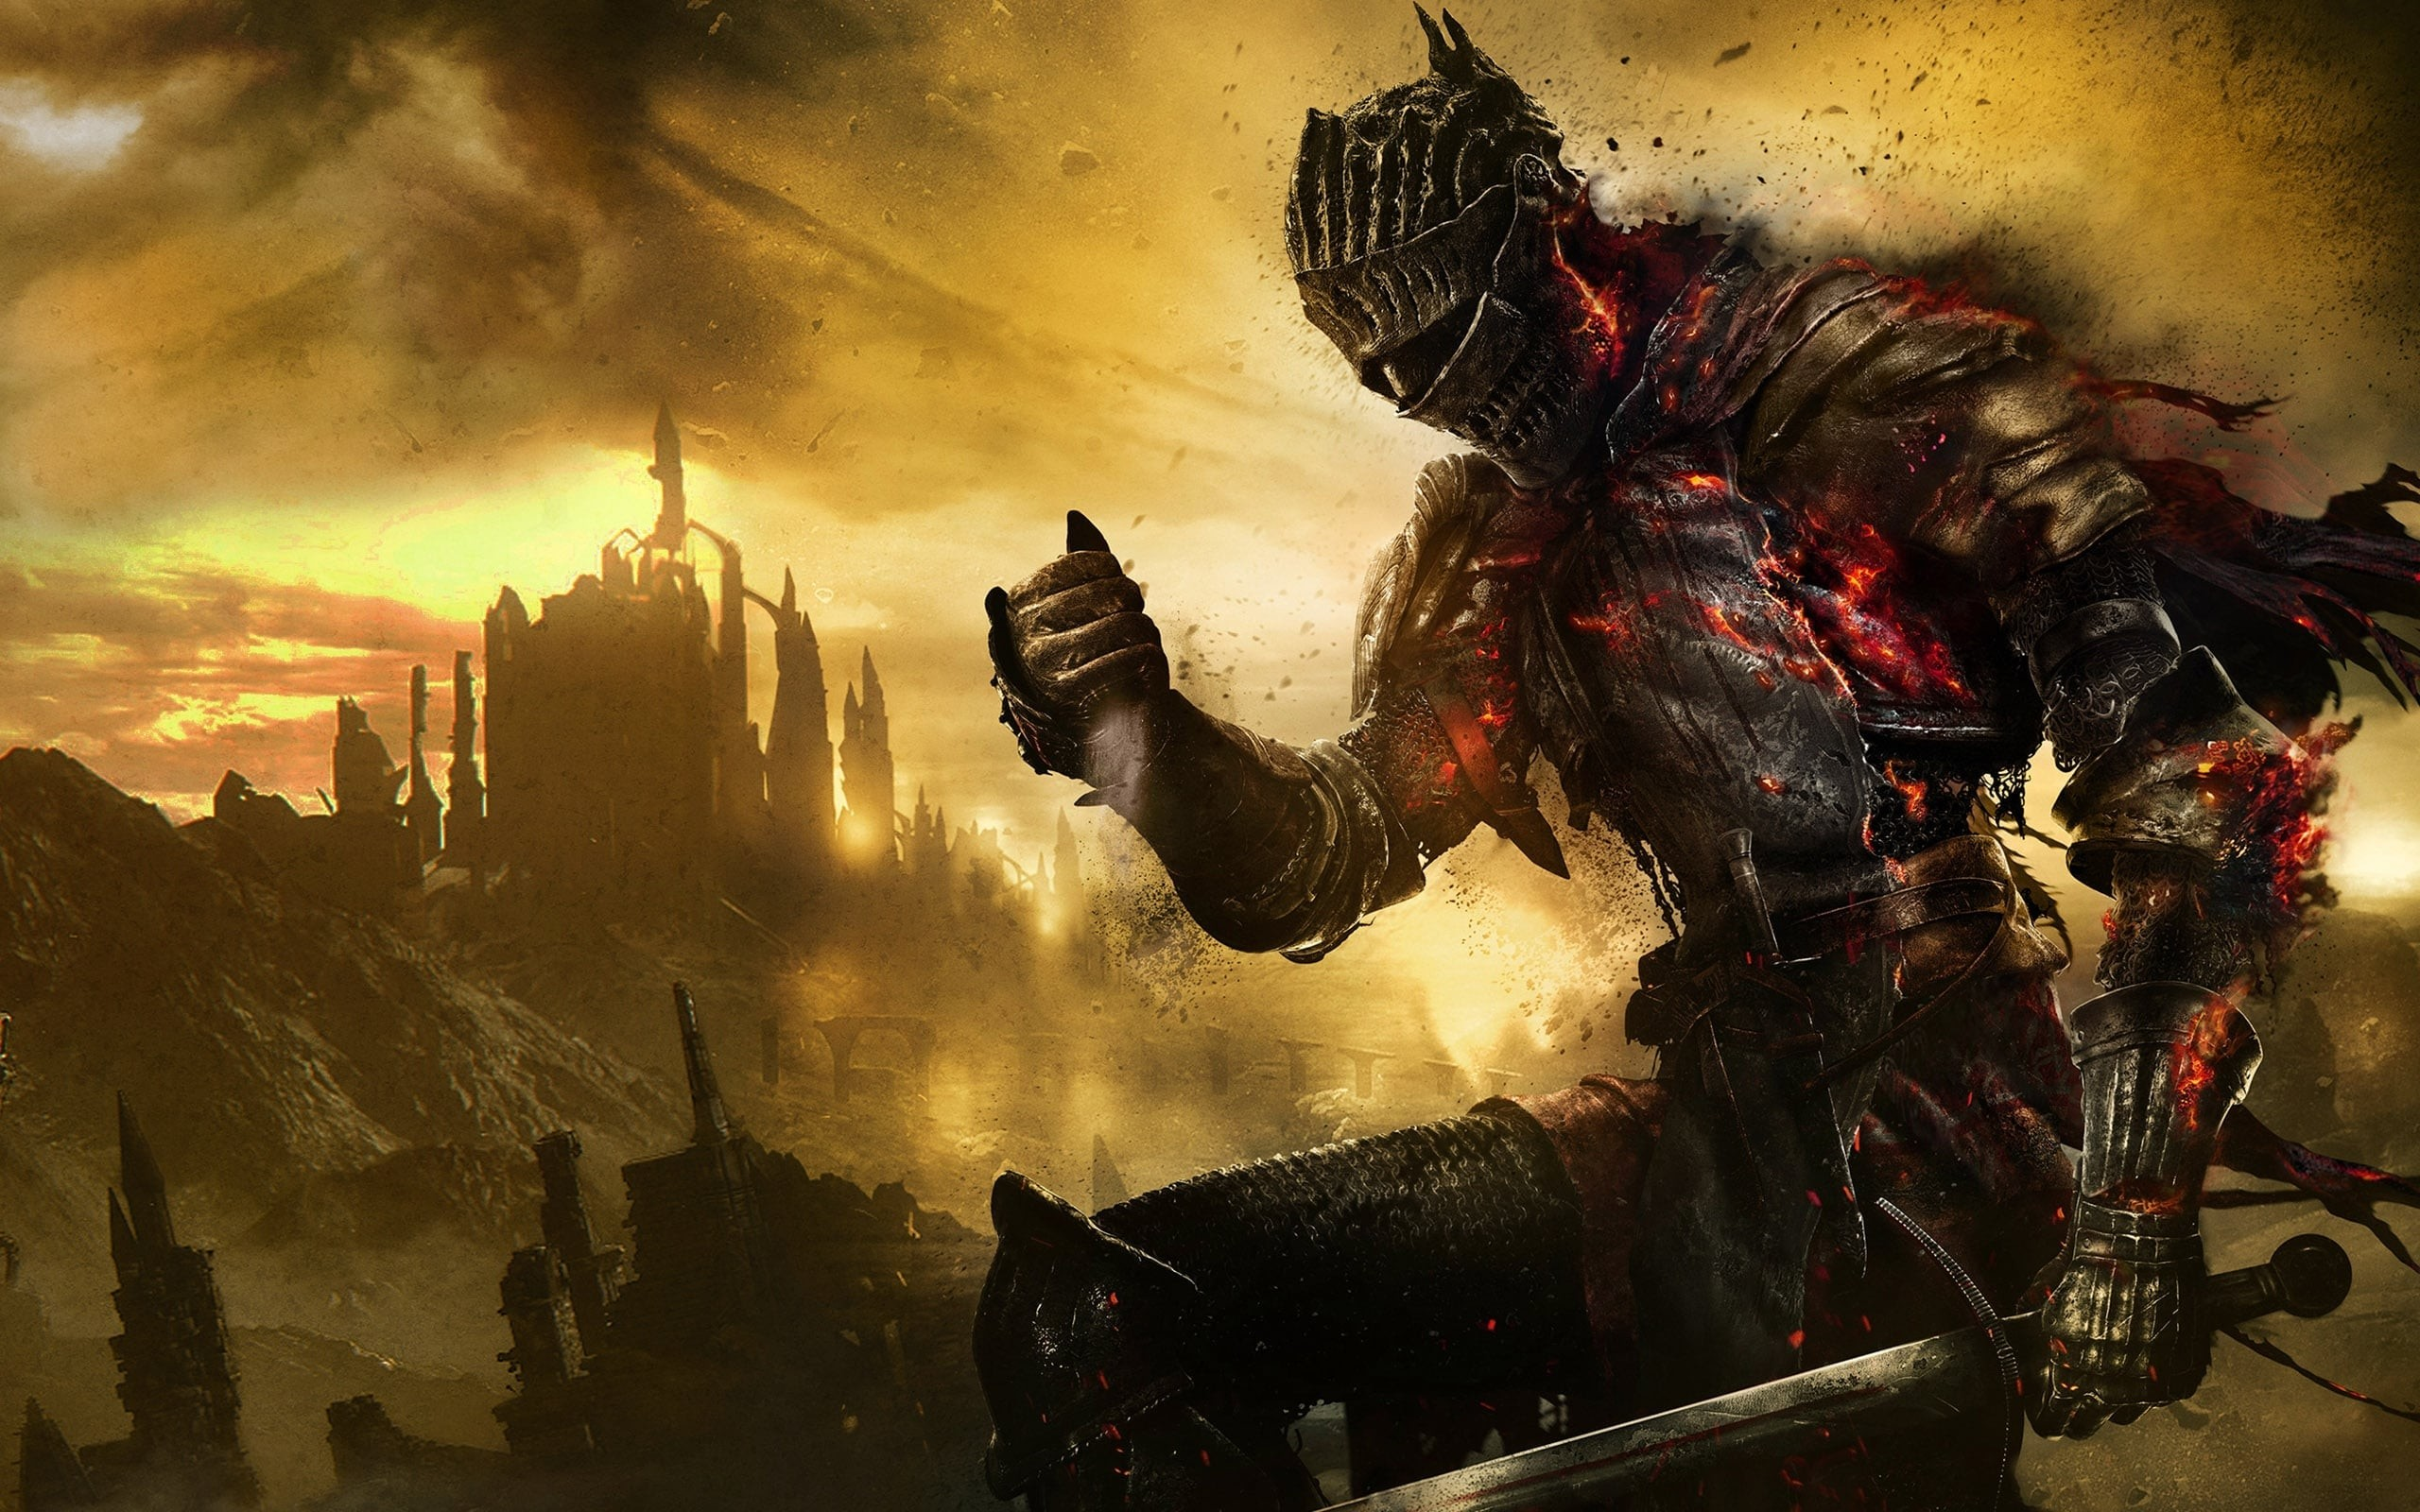 Dark Souls 3 PS4 | Games HD 4k Wallpapers